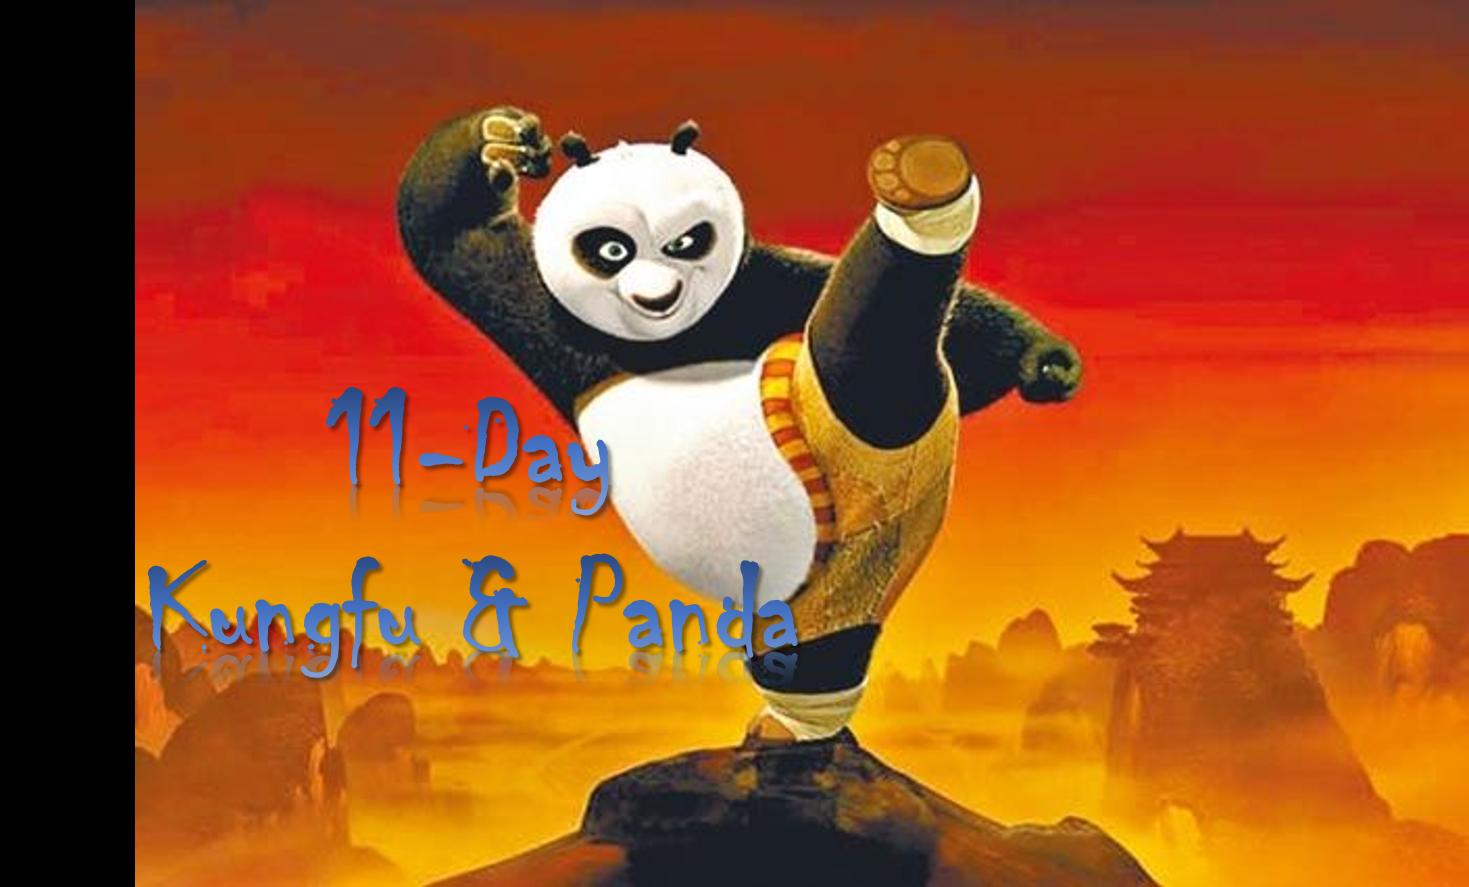 kungfu&panda